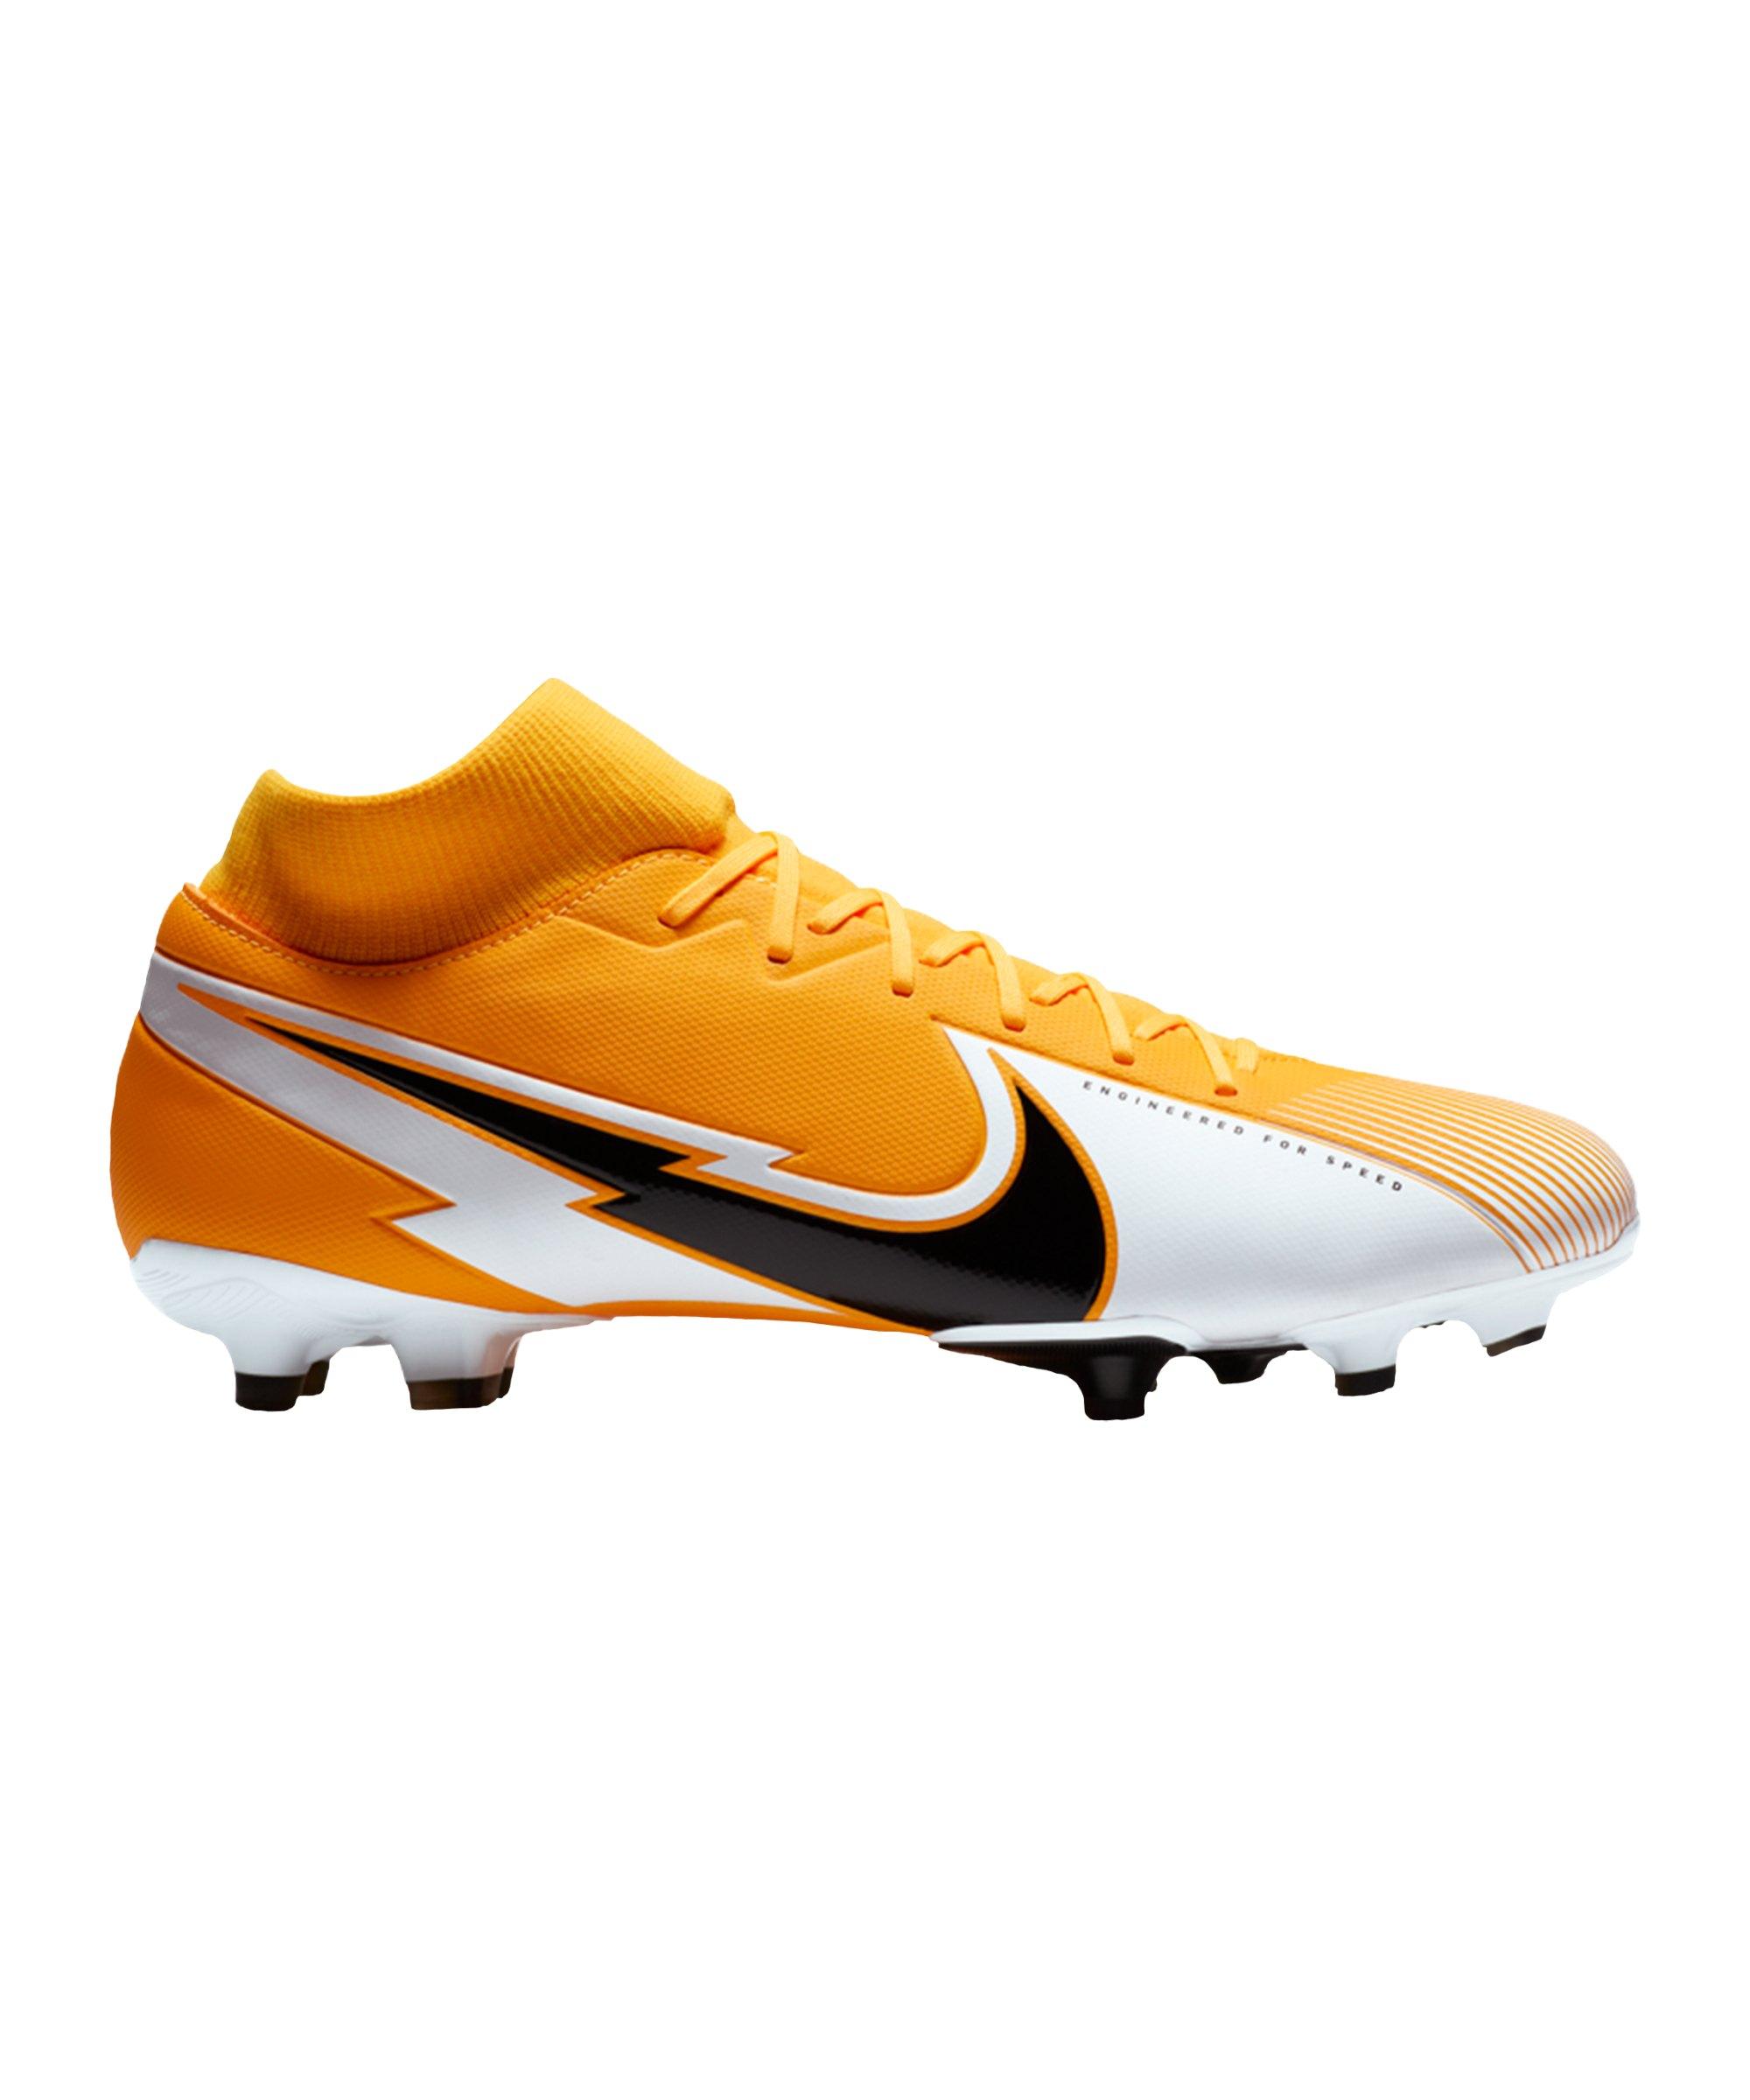 Nike Mercurial Superfly VII Daybreak Academy FG/MG Orange F801 - orange